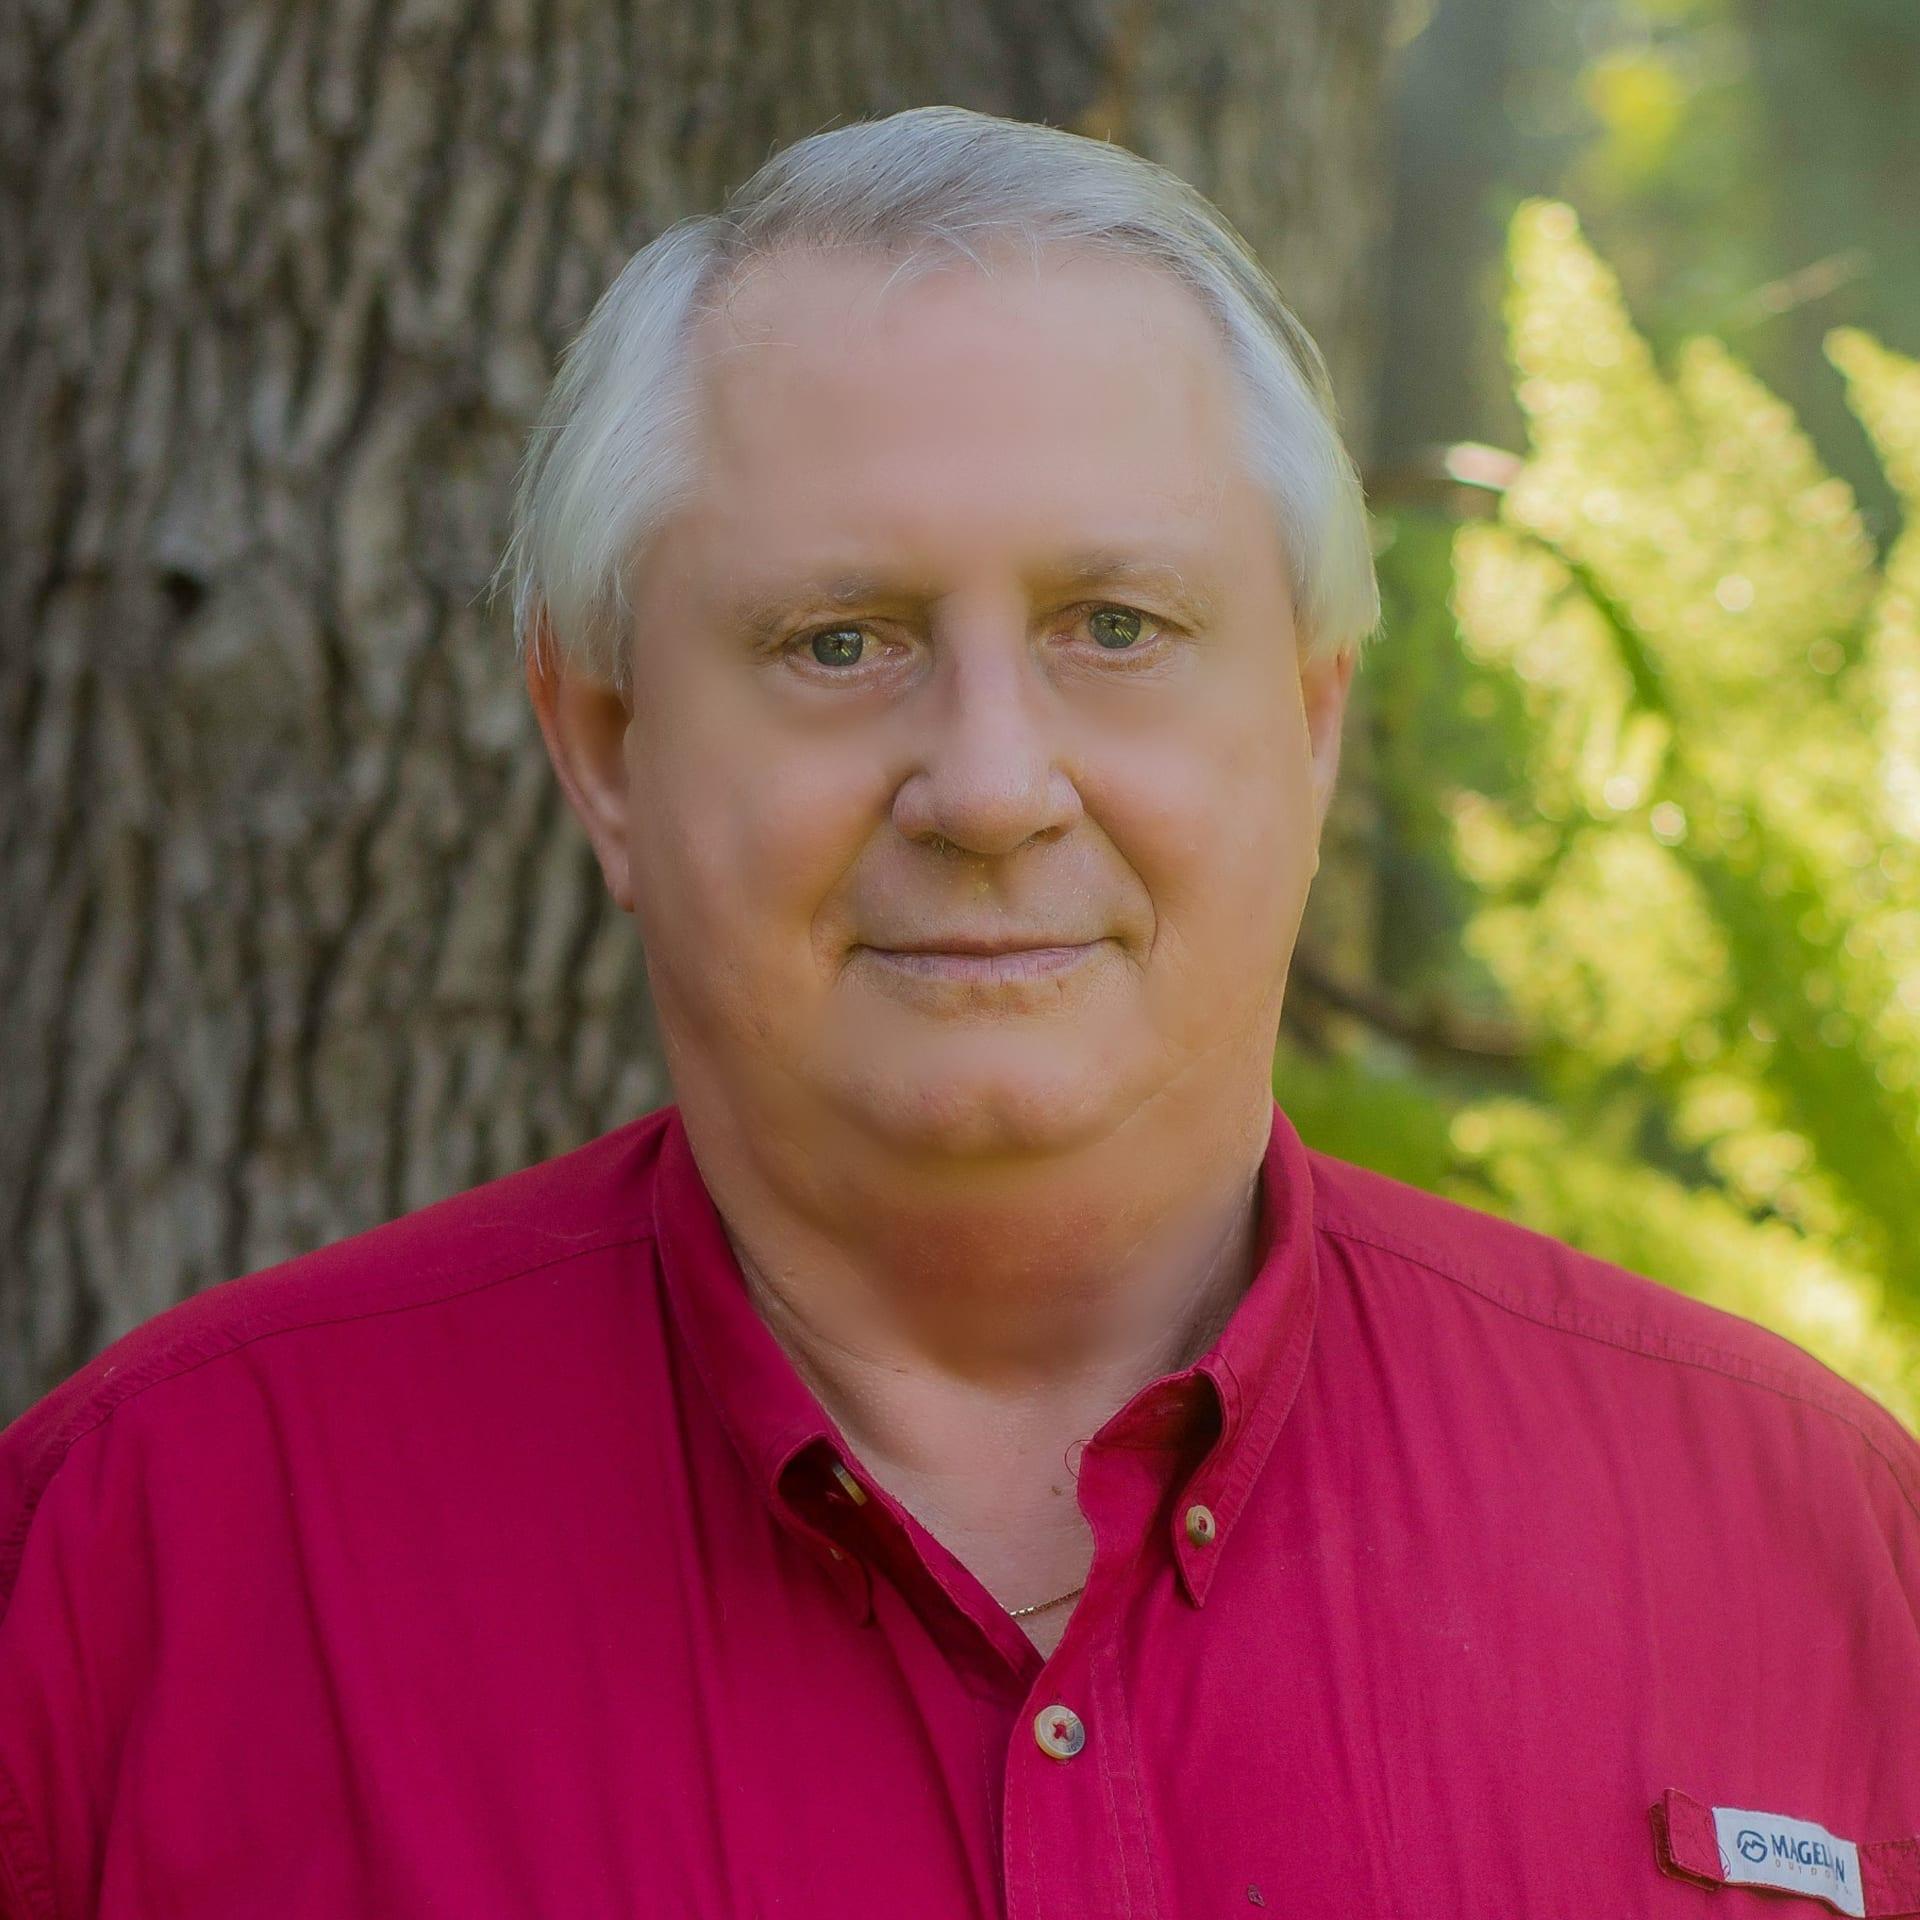 Dale Hicks